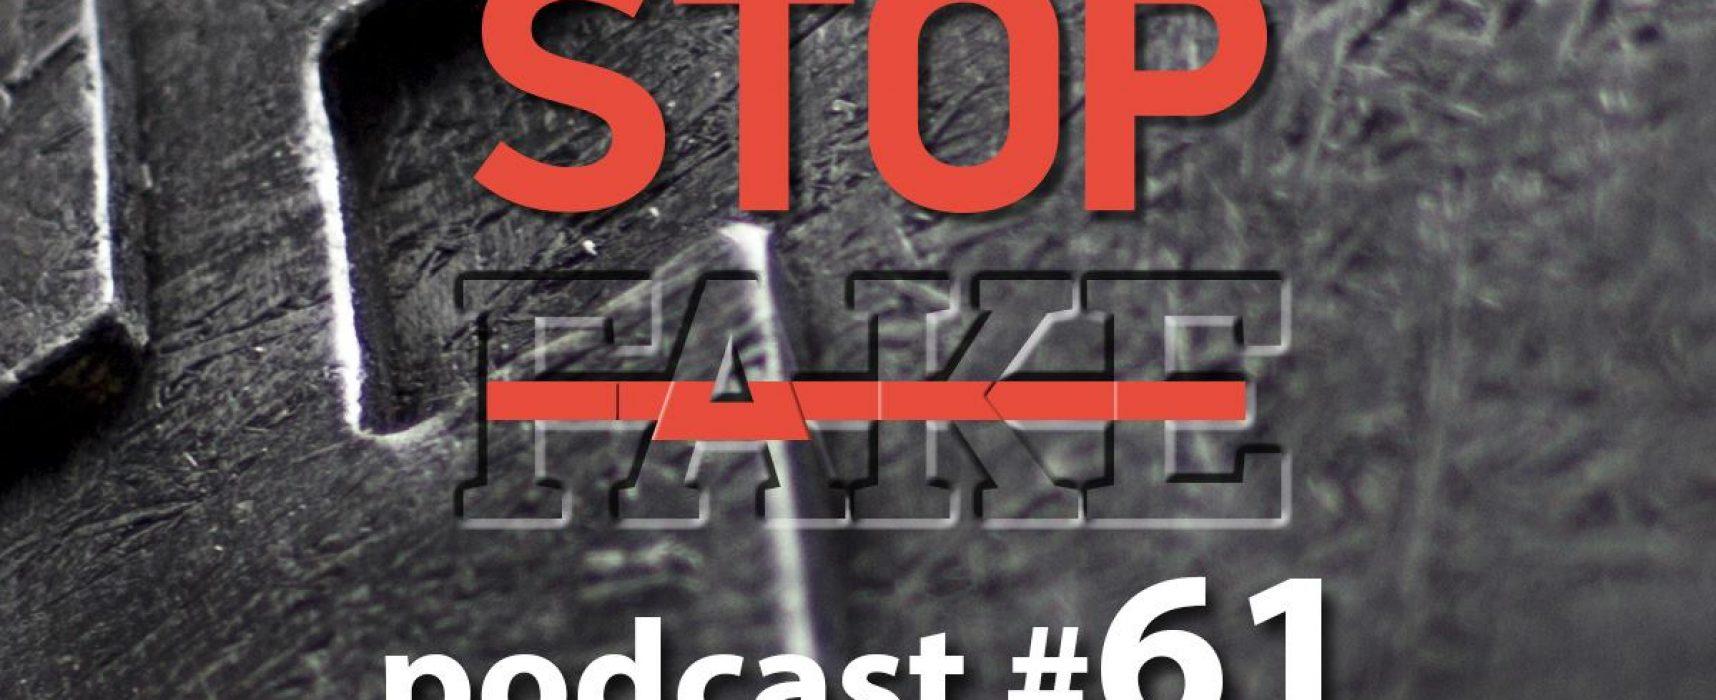 StopFake podcast #61